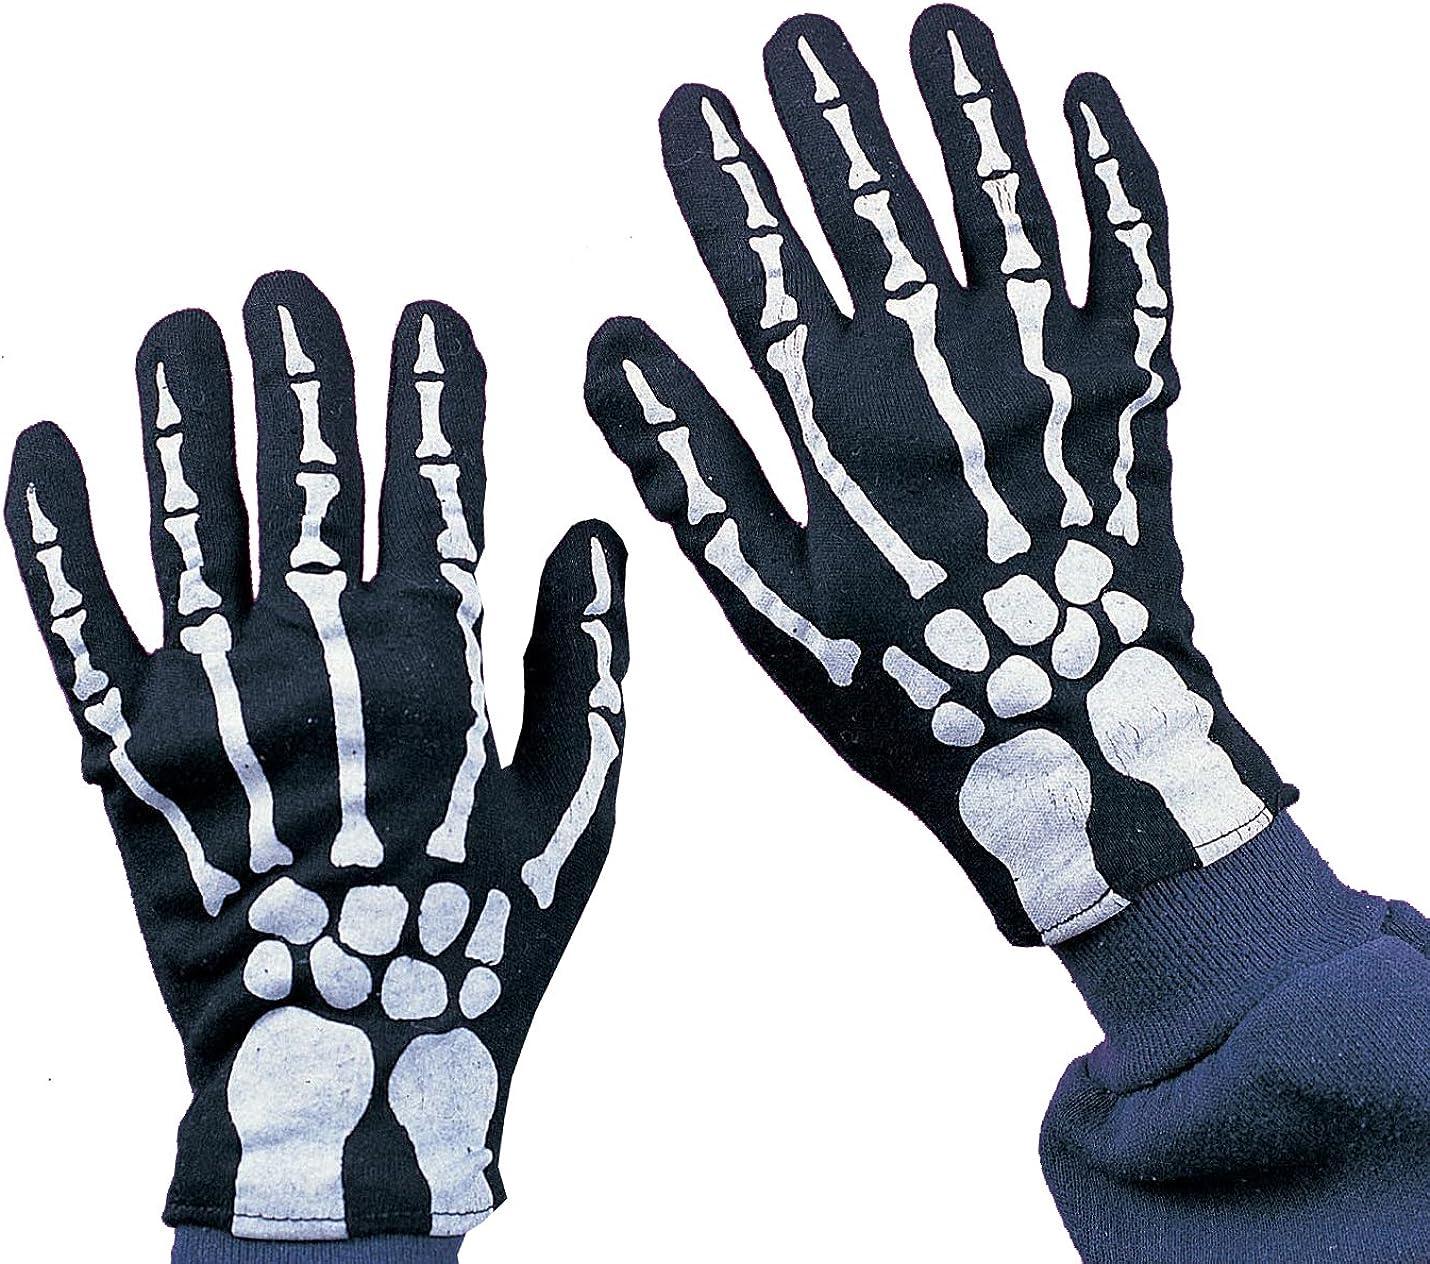 Pair of Child/'s Skeleton Halloween Gloves Black Gloves with Bone Print in White